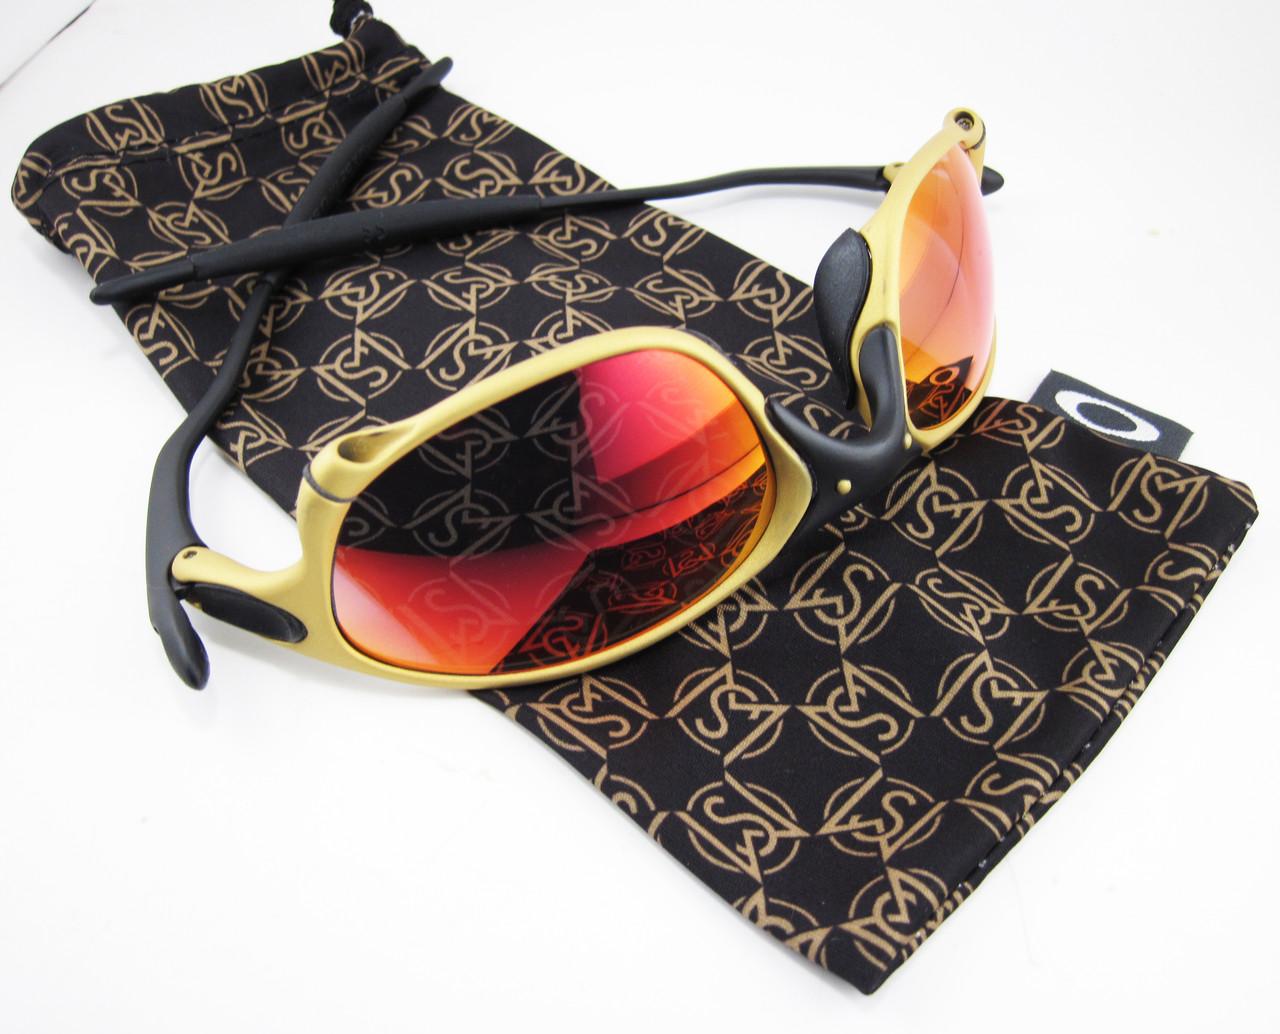 XX X Metal Black & Yellow Flip Custom Cerakote in Flat Black & Gold Metallic